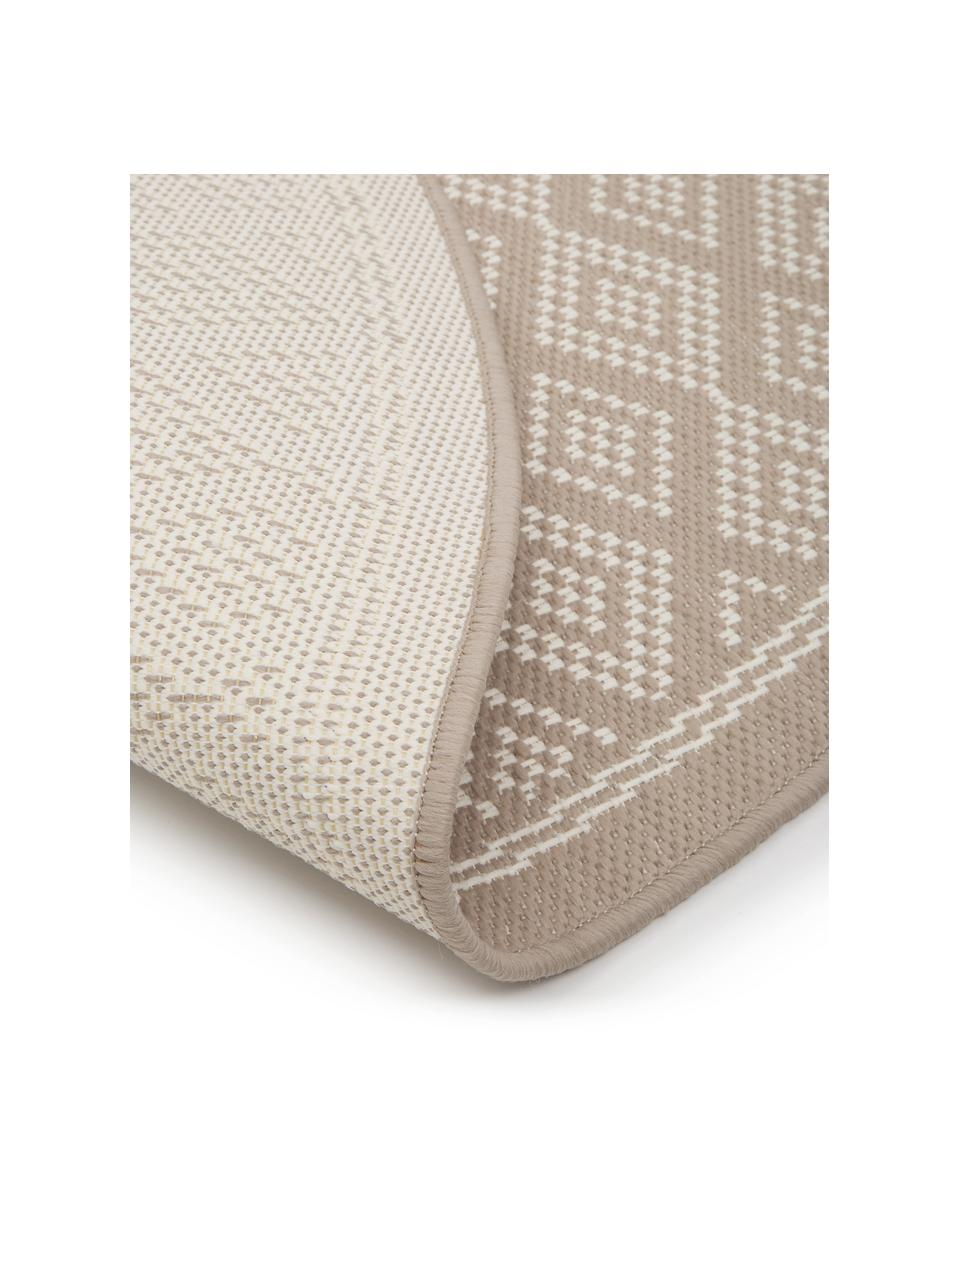 Tappeto beige/crema da interno-esterno Capri, 86% polipropilene, 14% poliestere, Bianco, beige, Ø 200 cm (taglia L)